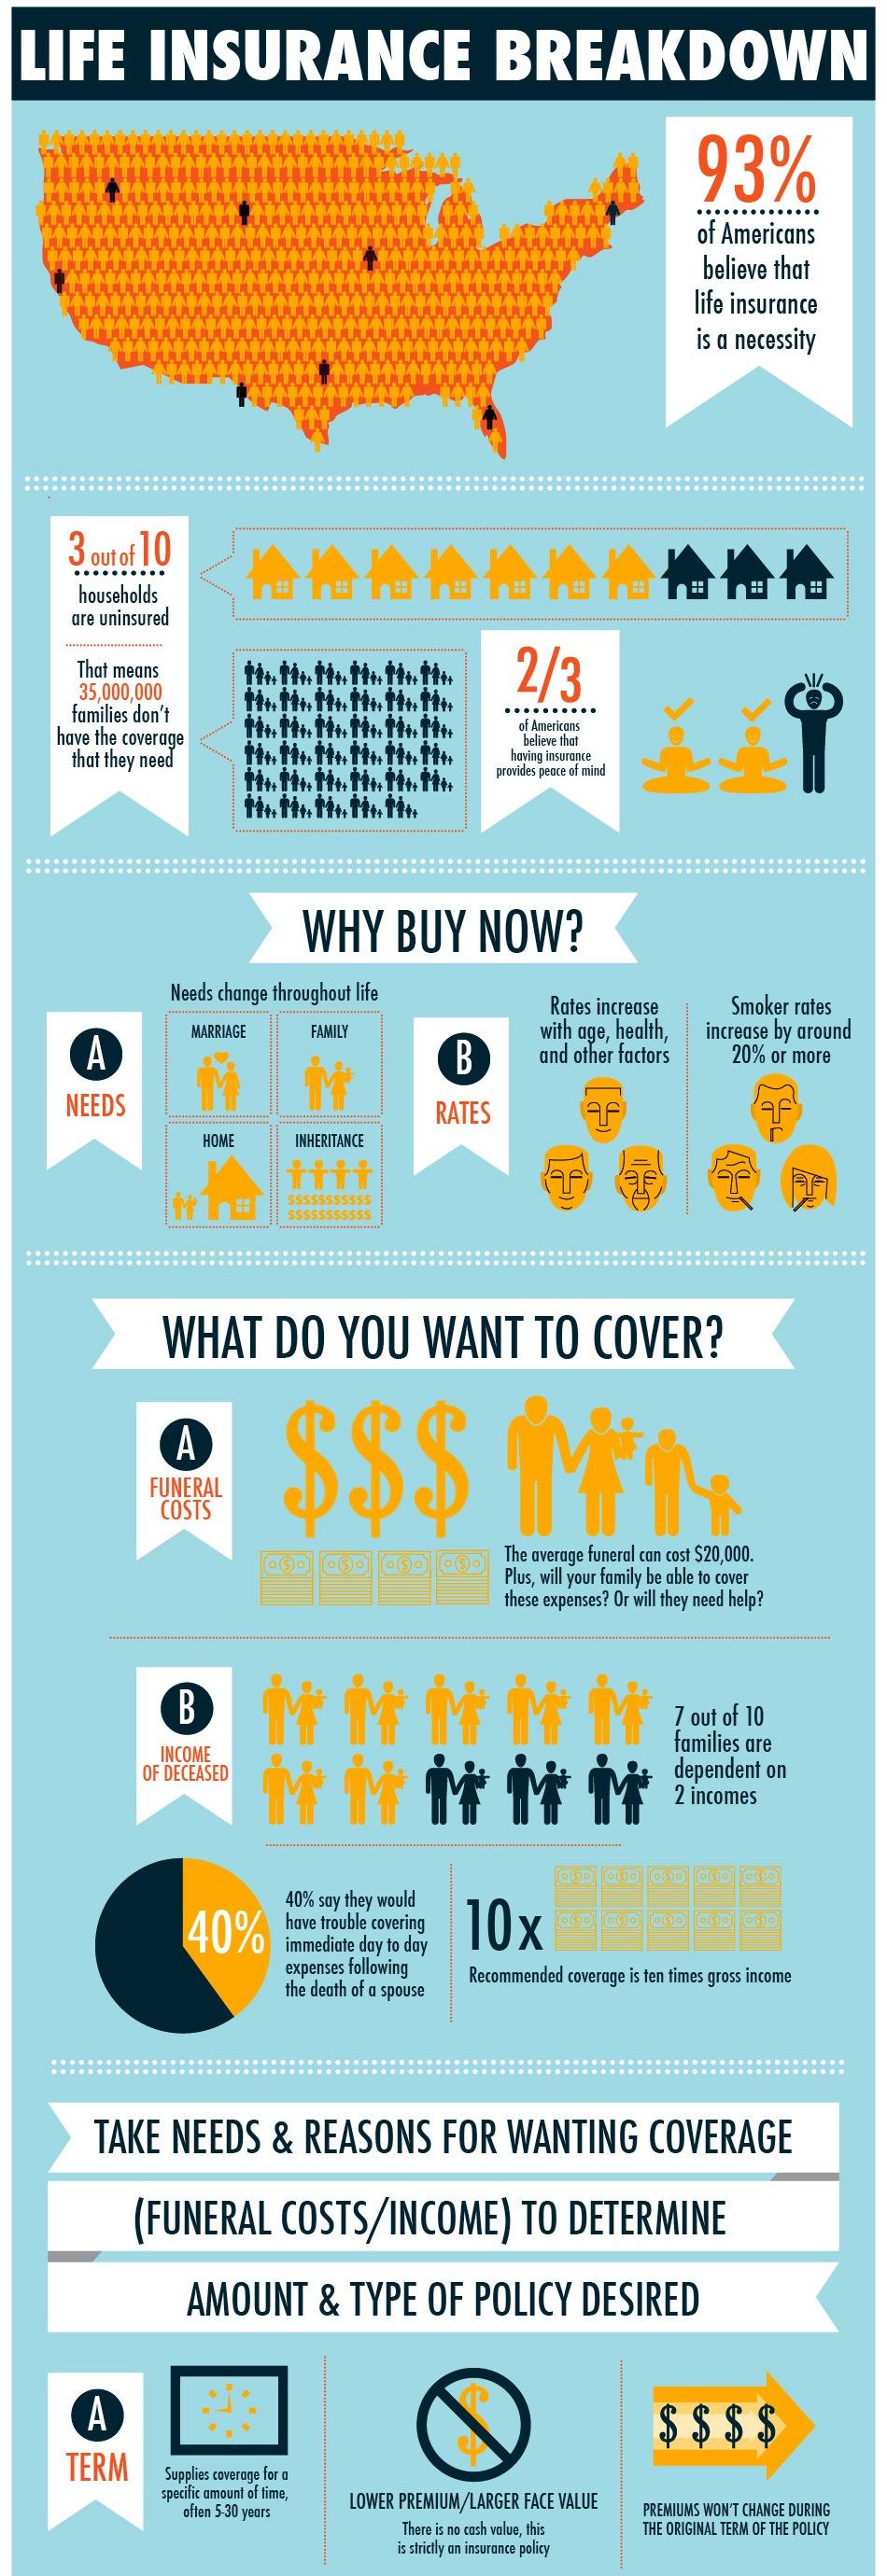 Life-Insurance-Infographic.jpg